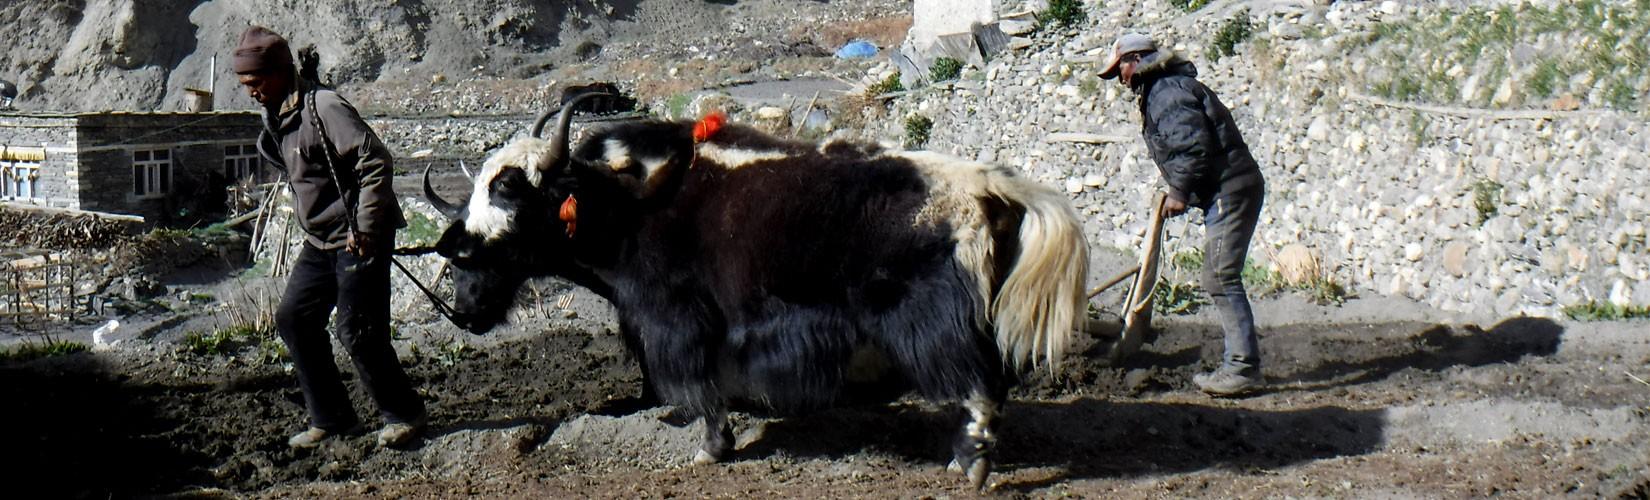 Ploughing Yak in Nepal